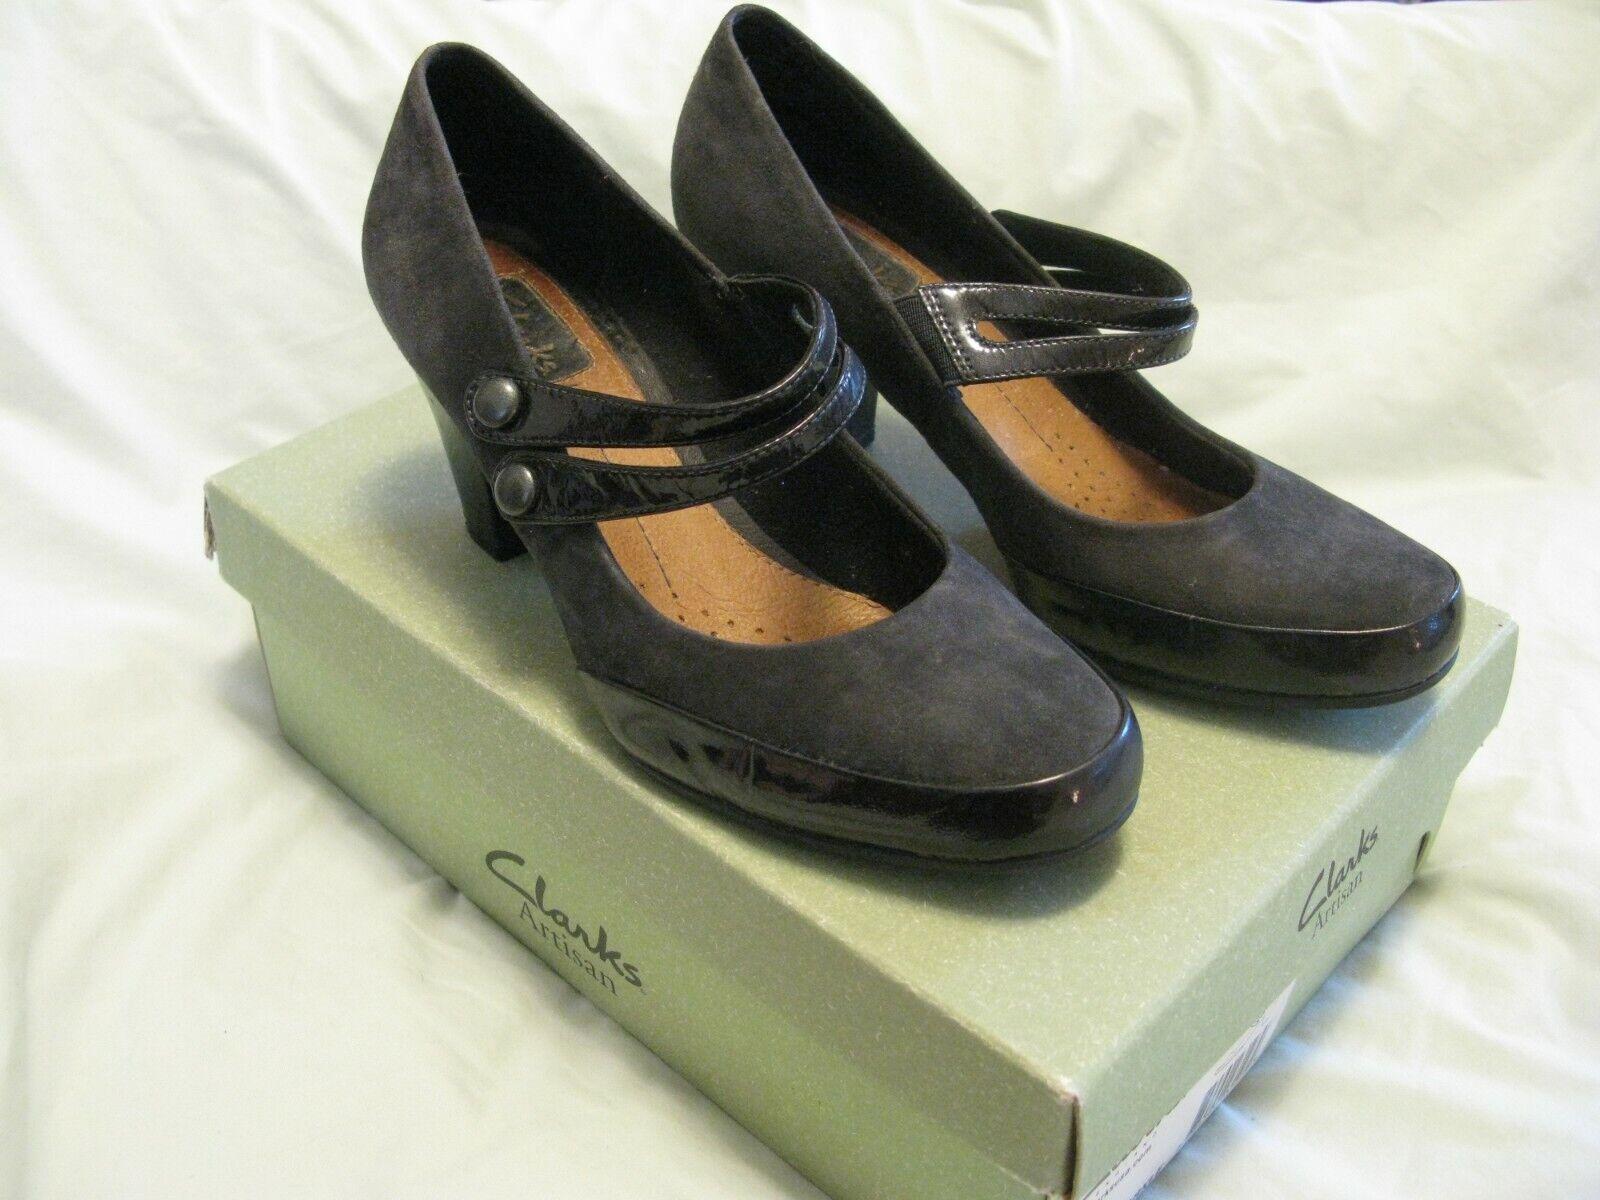 Clarks 'Diamond Sparkle' Heels Sz 7 Pewter Gorgeous Rare Style Pre-Owned